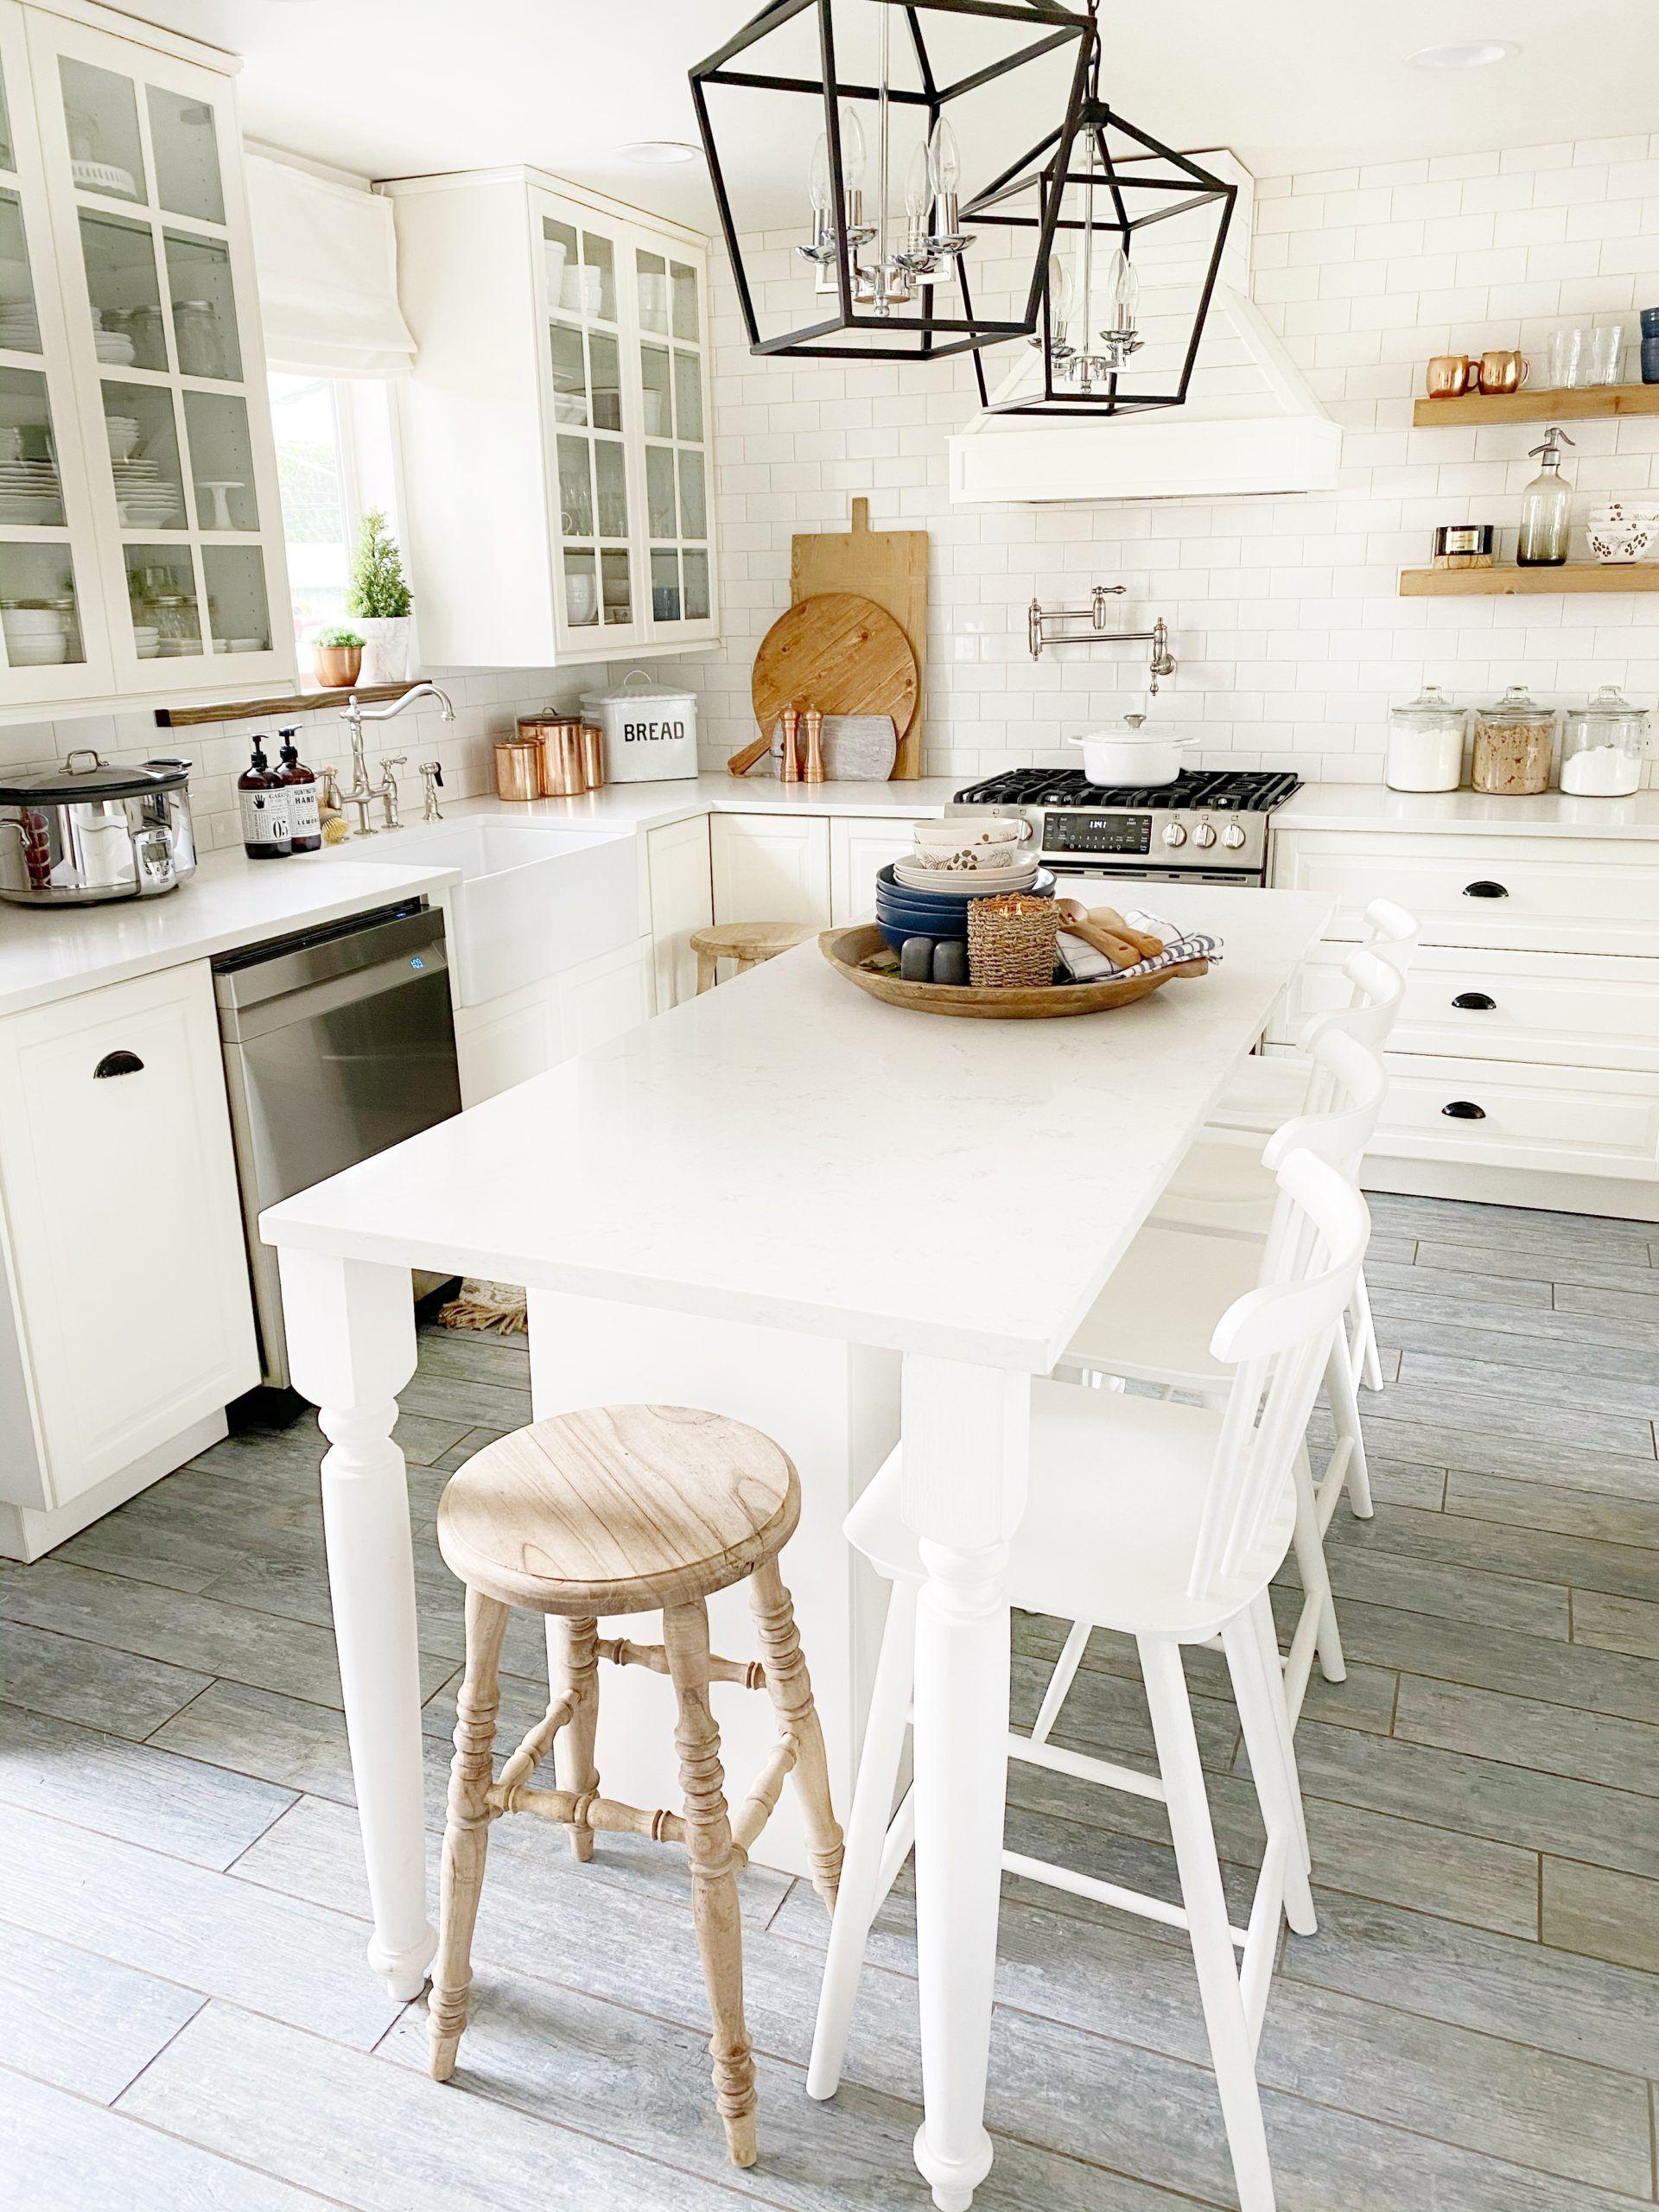 Fall Decor Ideas Bed Bath Beyond Kitchen Decor Inspiration Decor Fall Decor